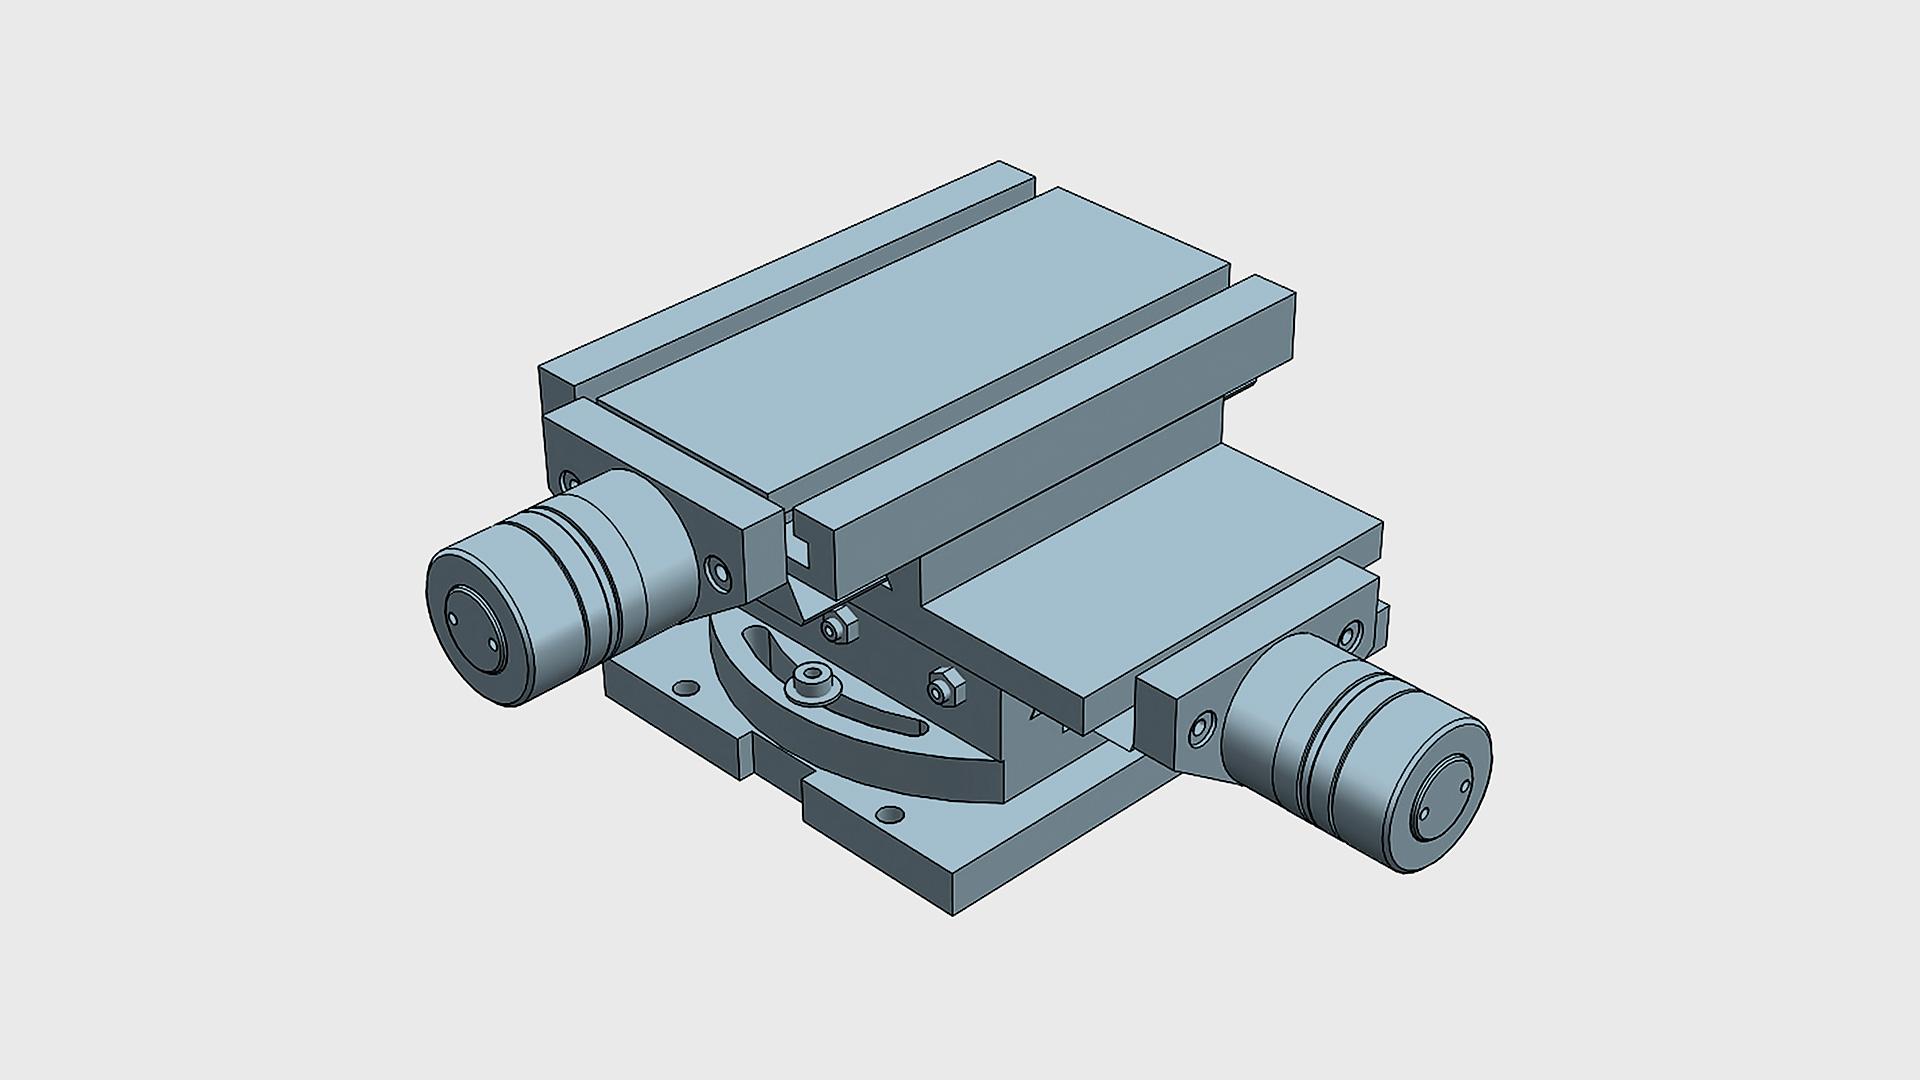 MG MINI. XY MINI Coordinate table with rotary basis